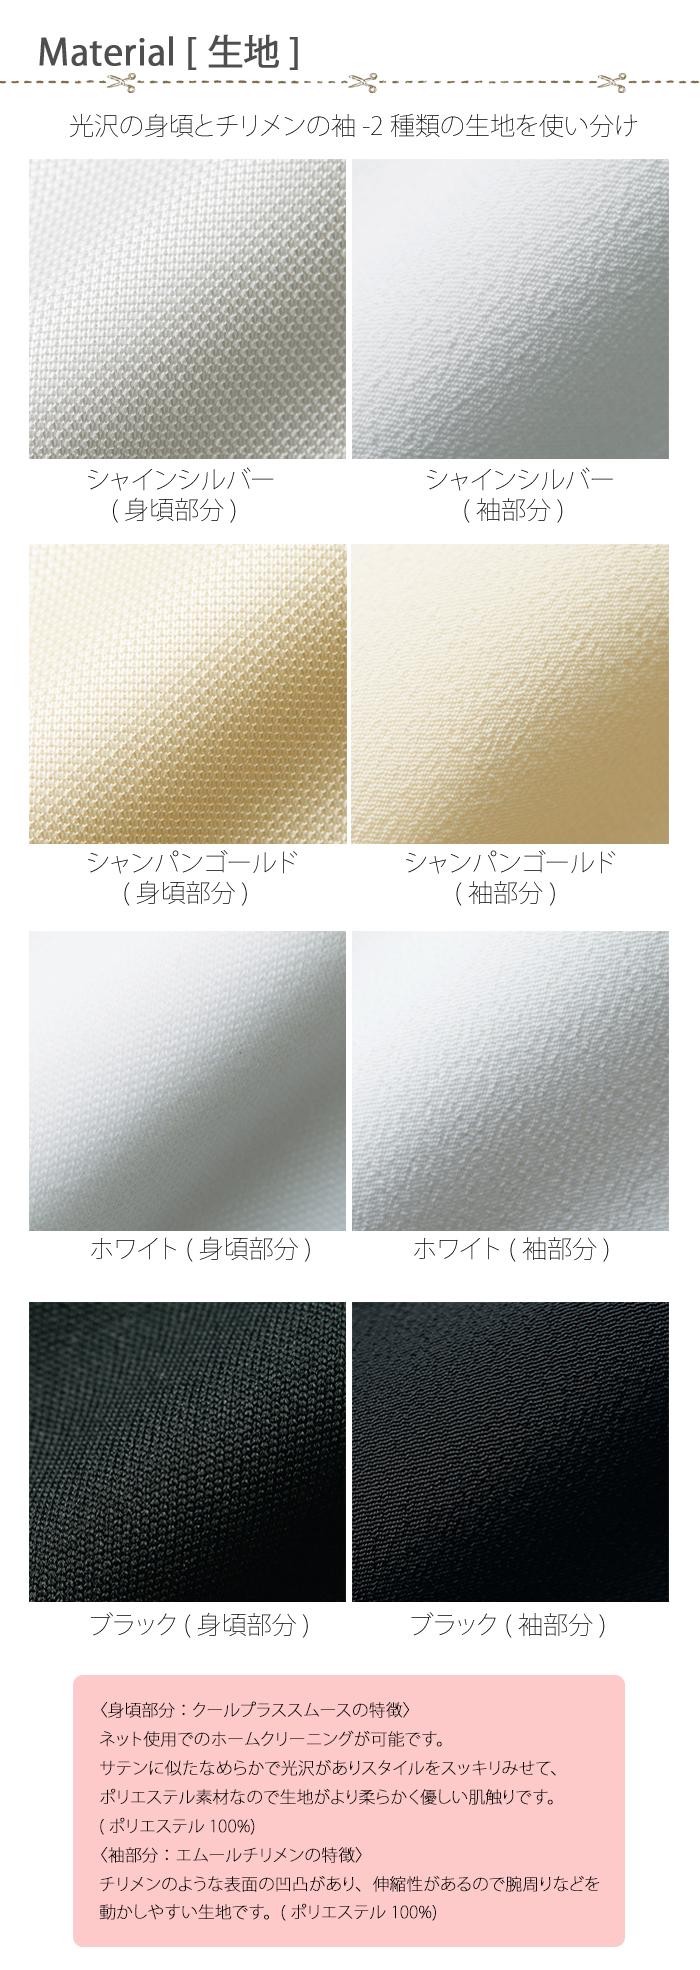 FB4033L光沢なめらか長袖カットソー[女性用](4色) 生地説明